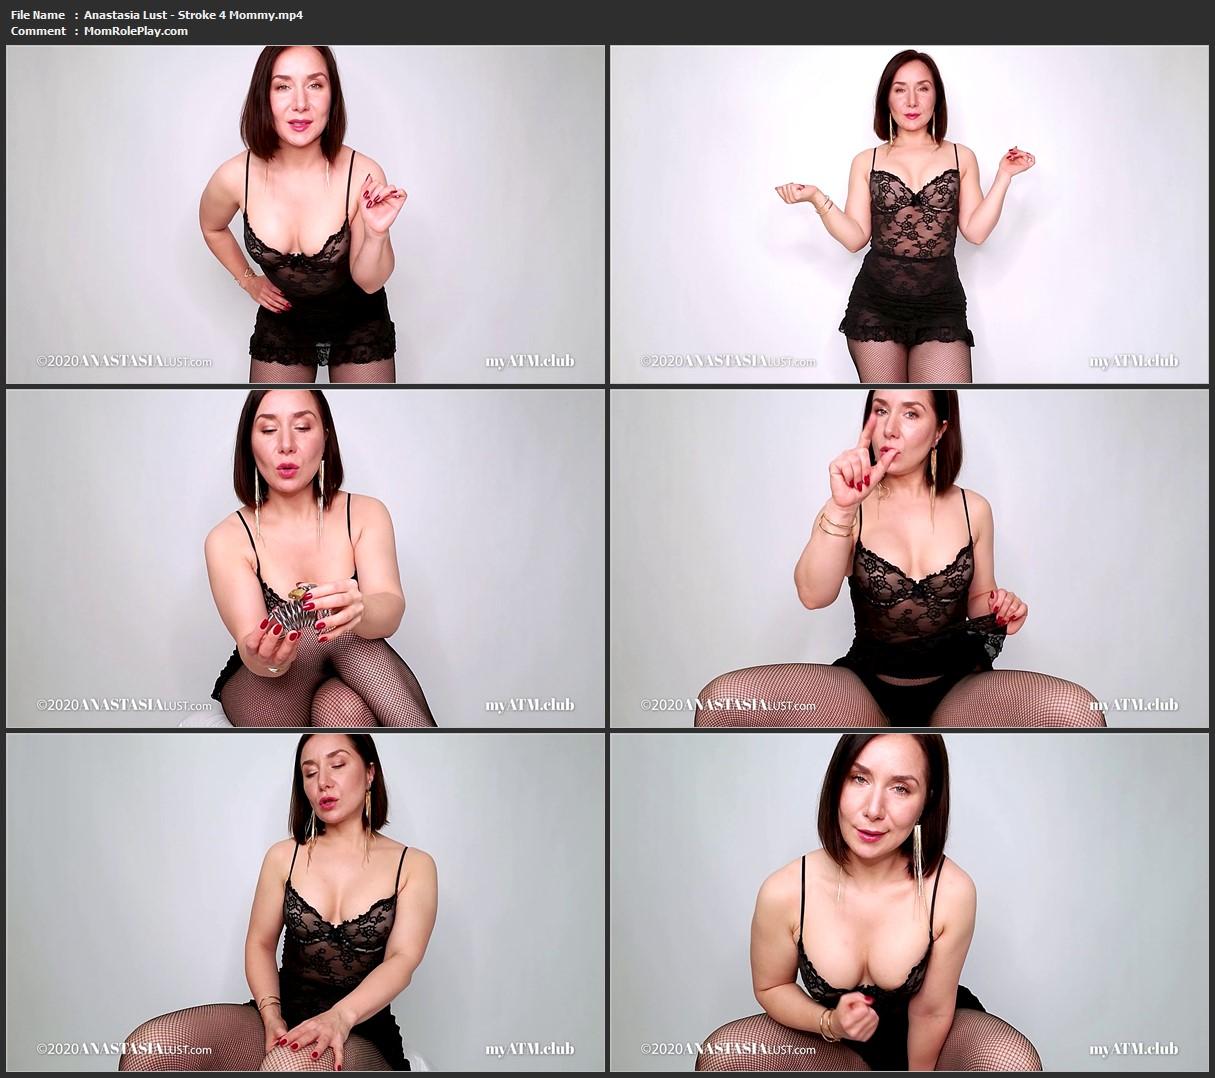 Anastasia Lust - Stroke 4 Mommy